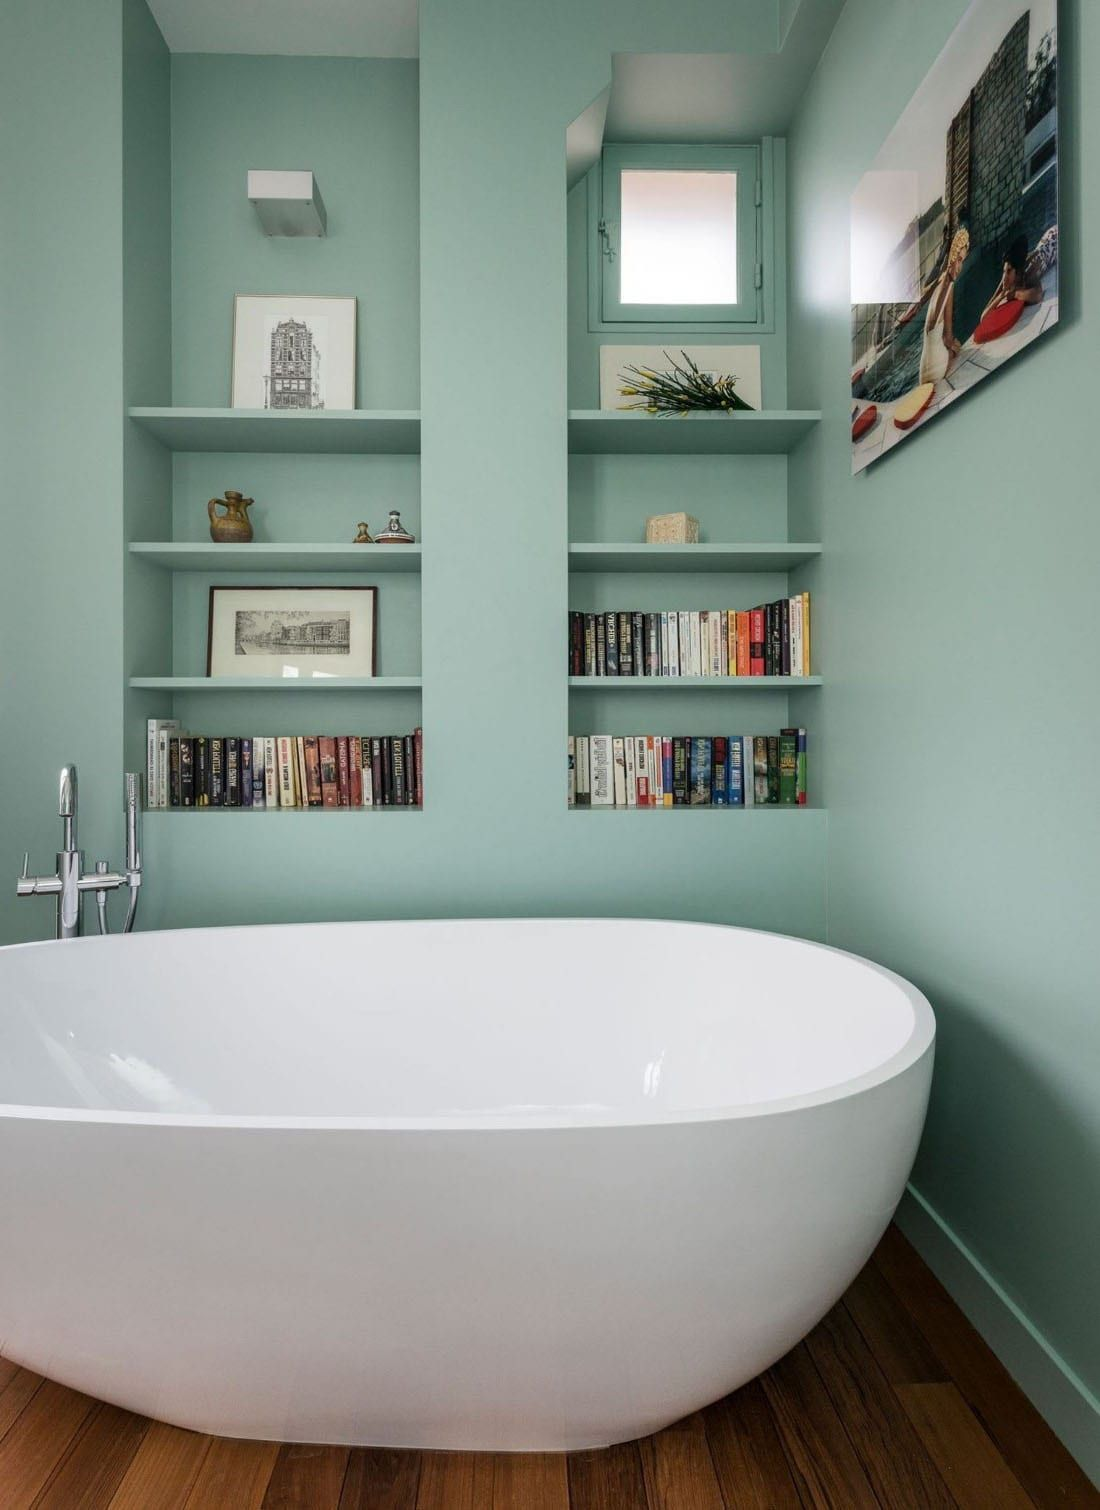 44+ Salle de bain vert deau et bois ideas in 2021